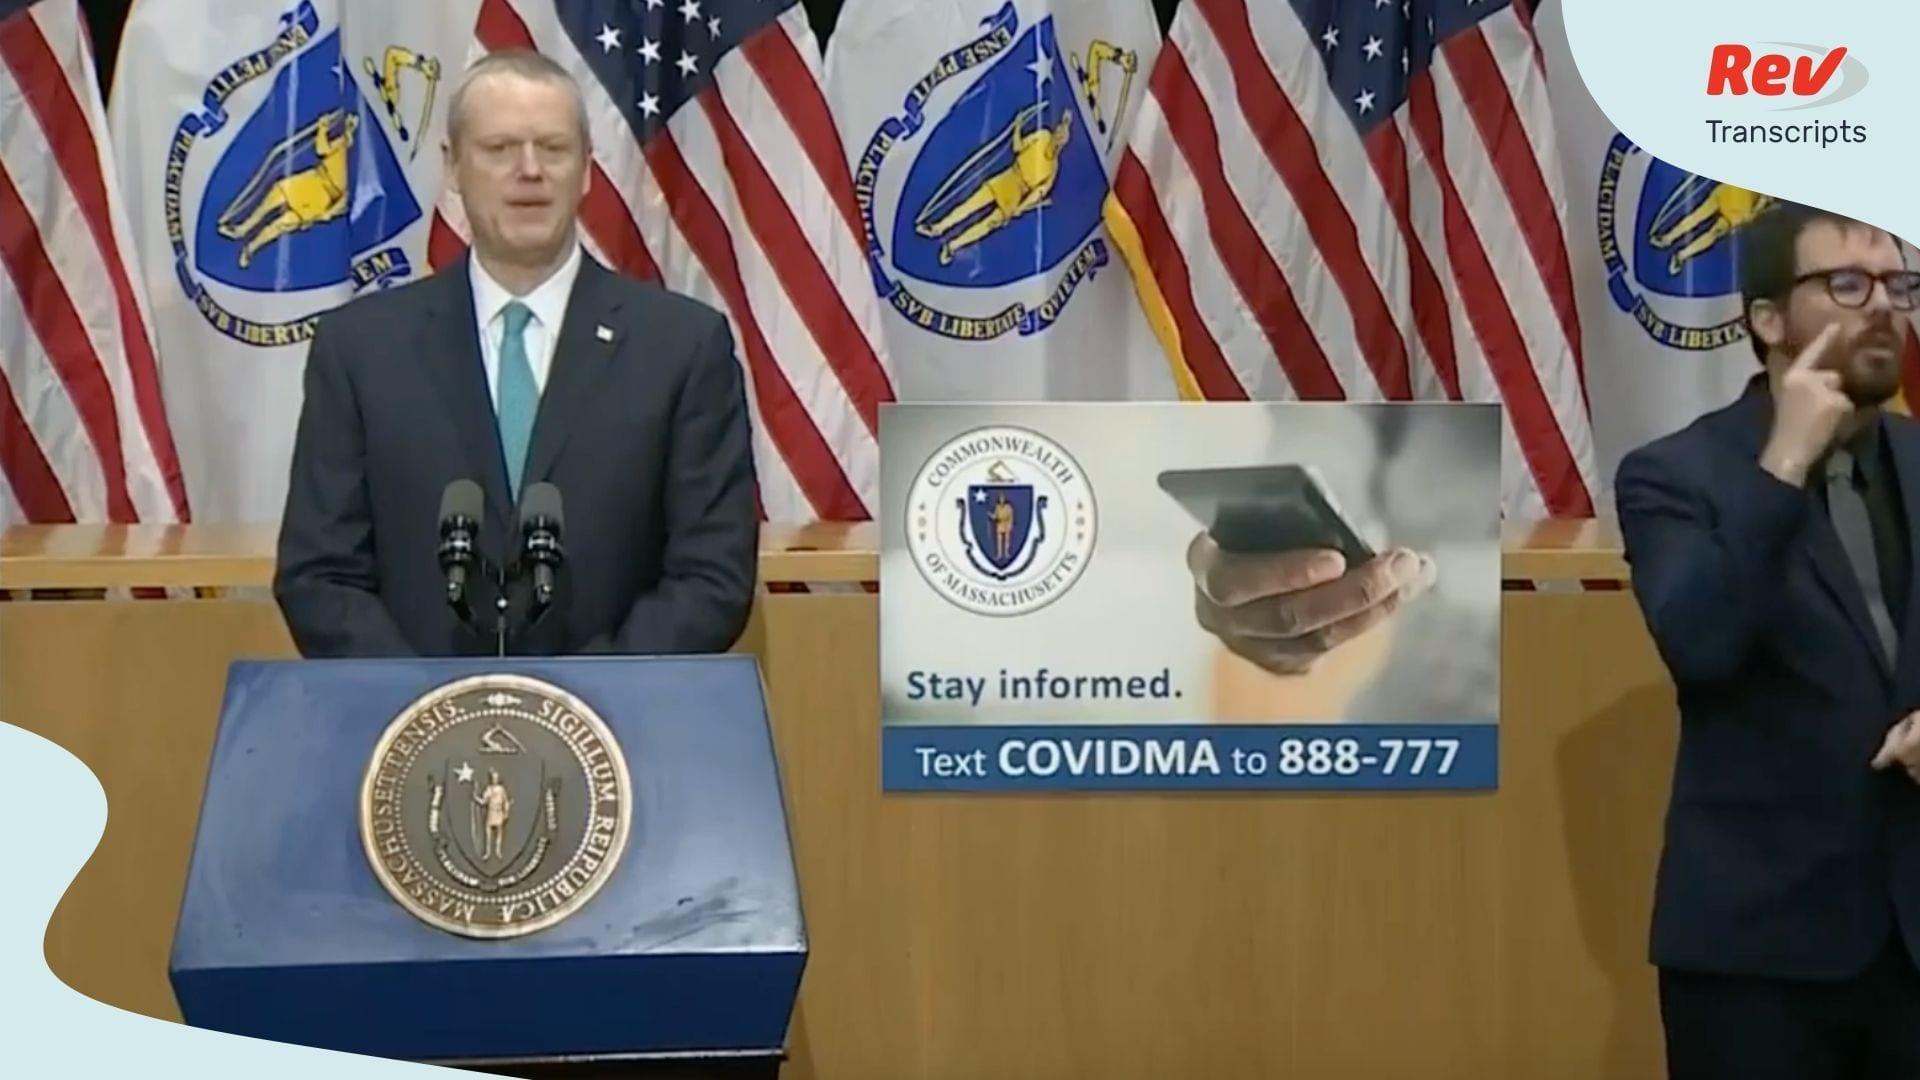 Massachusetts Governor COVID-19 Update